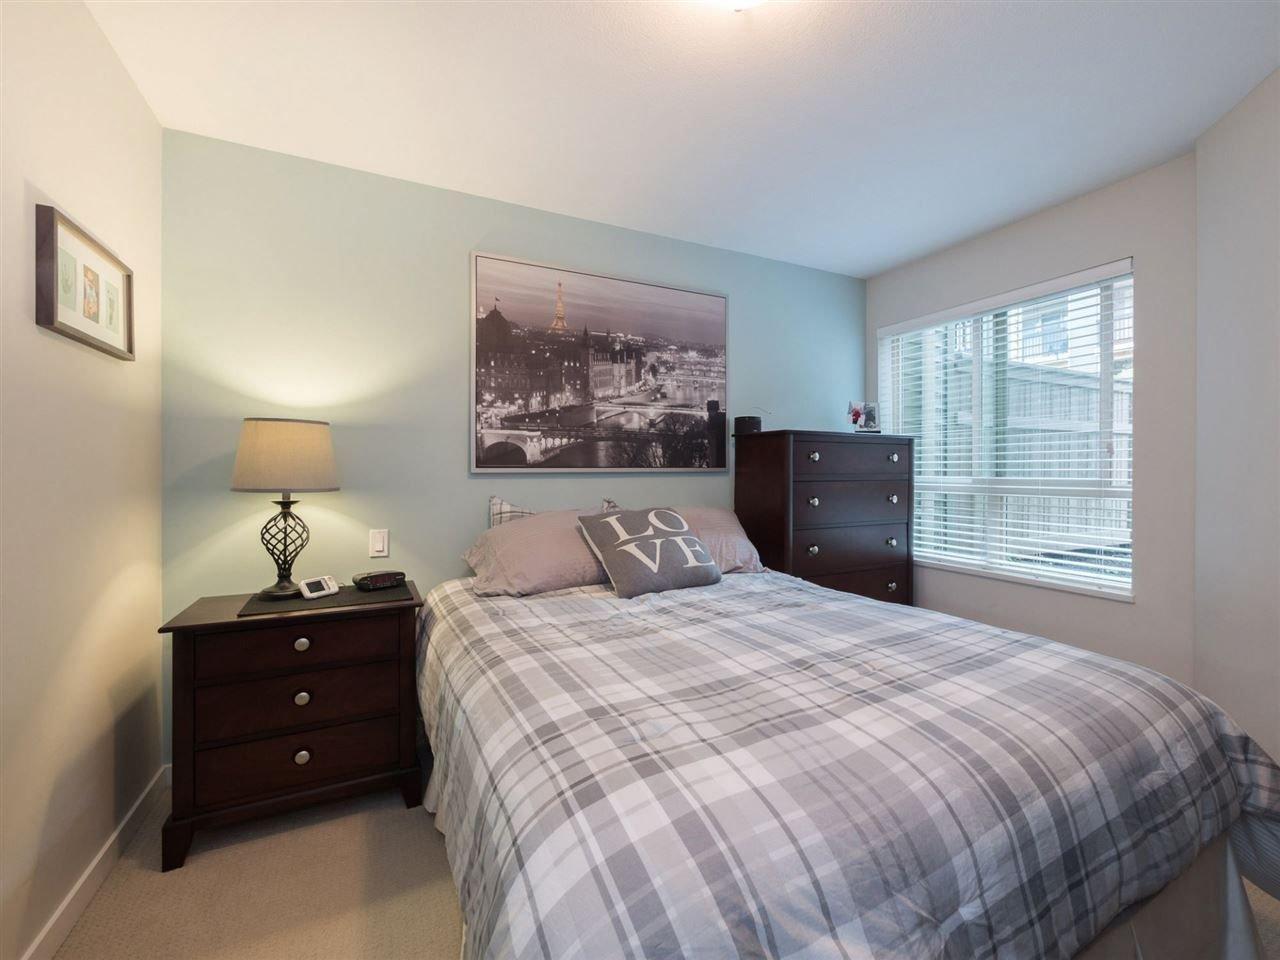 "Photo 9: Photos: 116 21009 56 Avenue in Langley: Salmon River Condo for sale in ""CORNERSTONE"" : MLS®# R2296673"